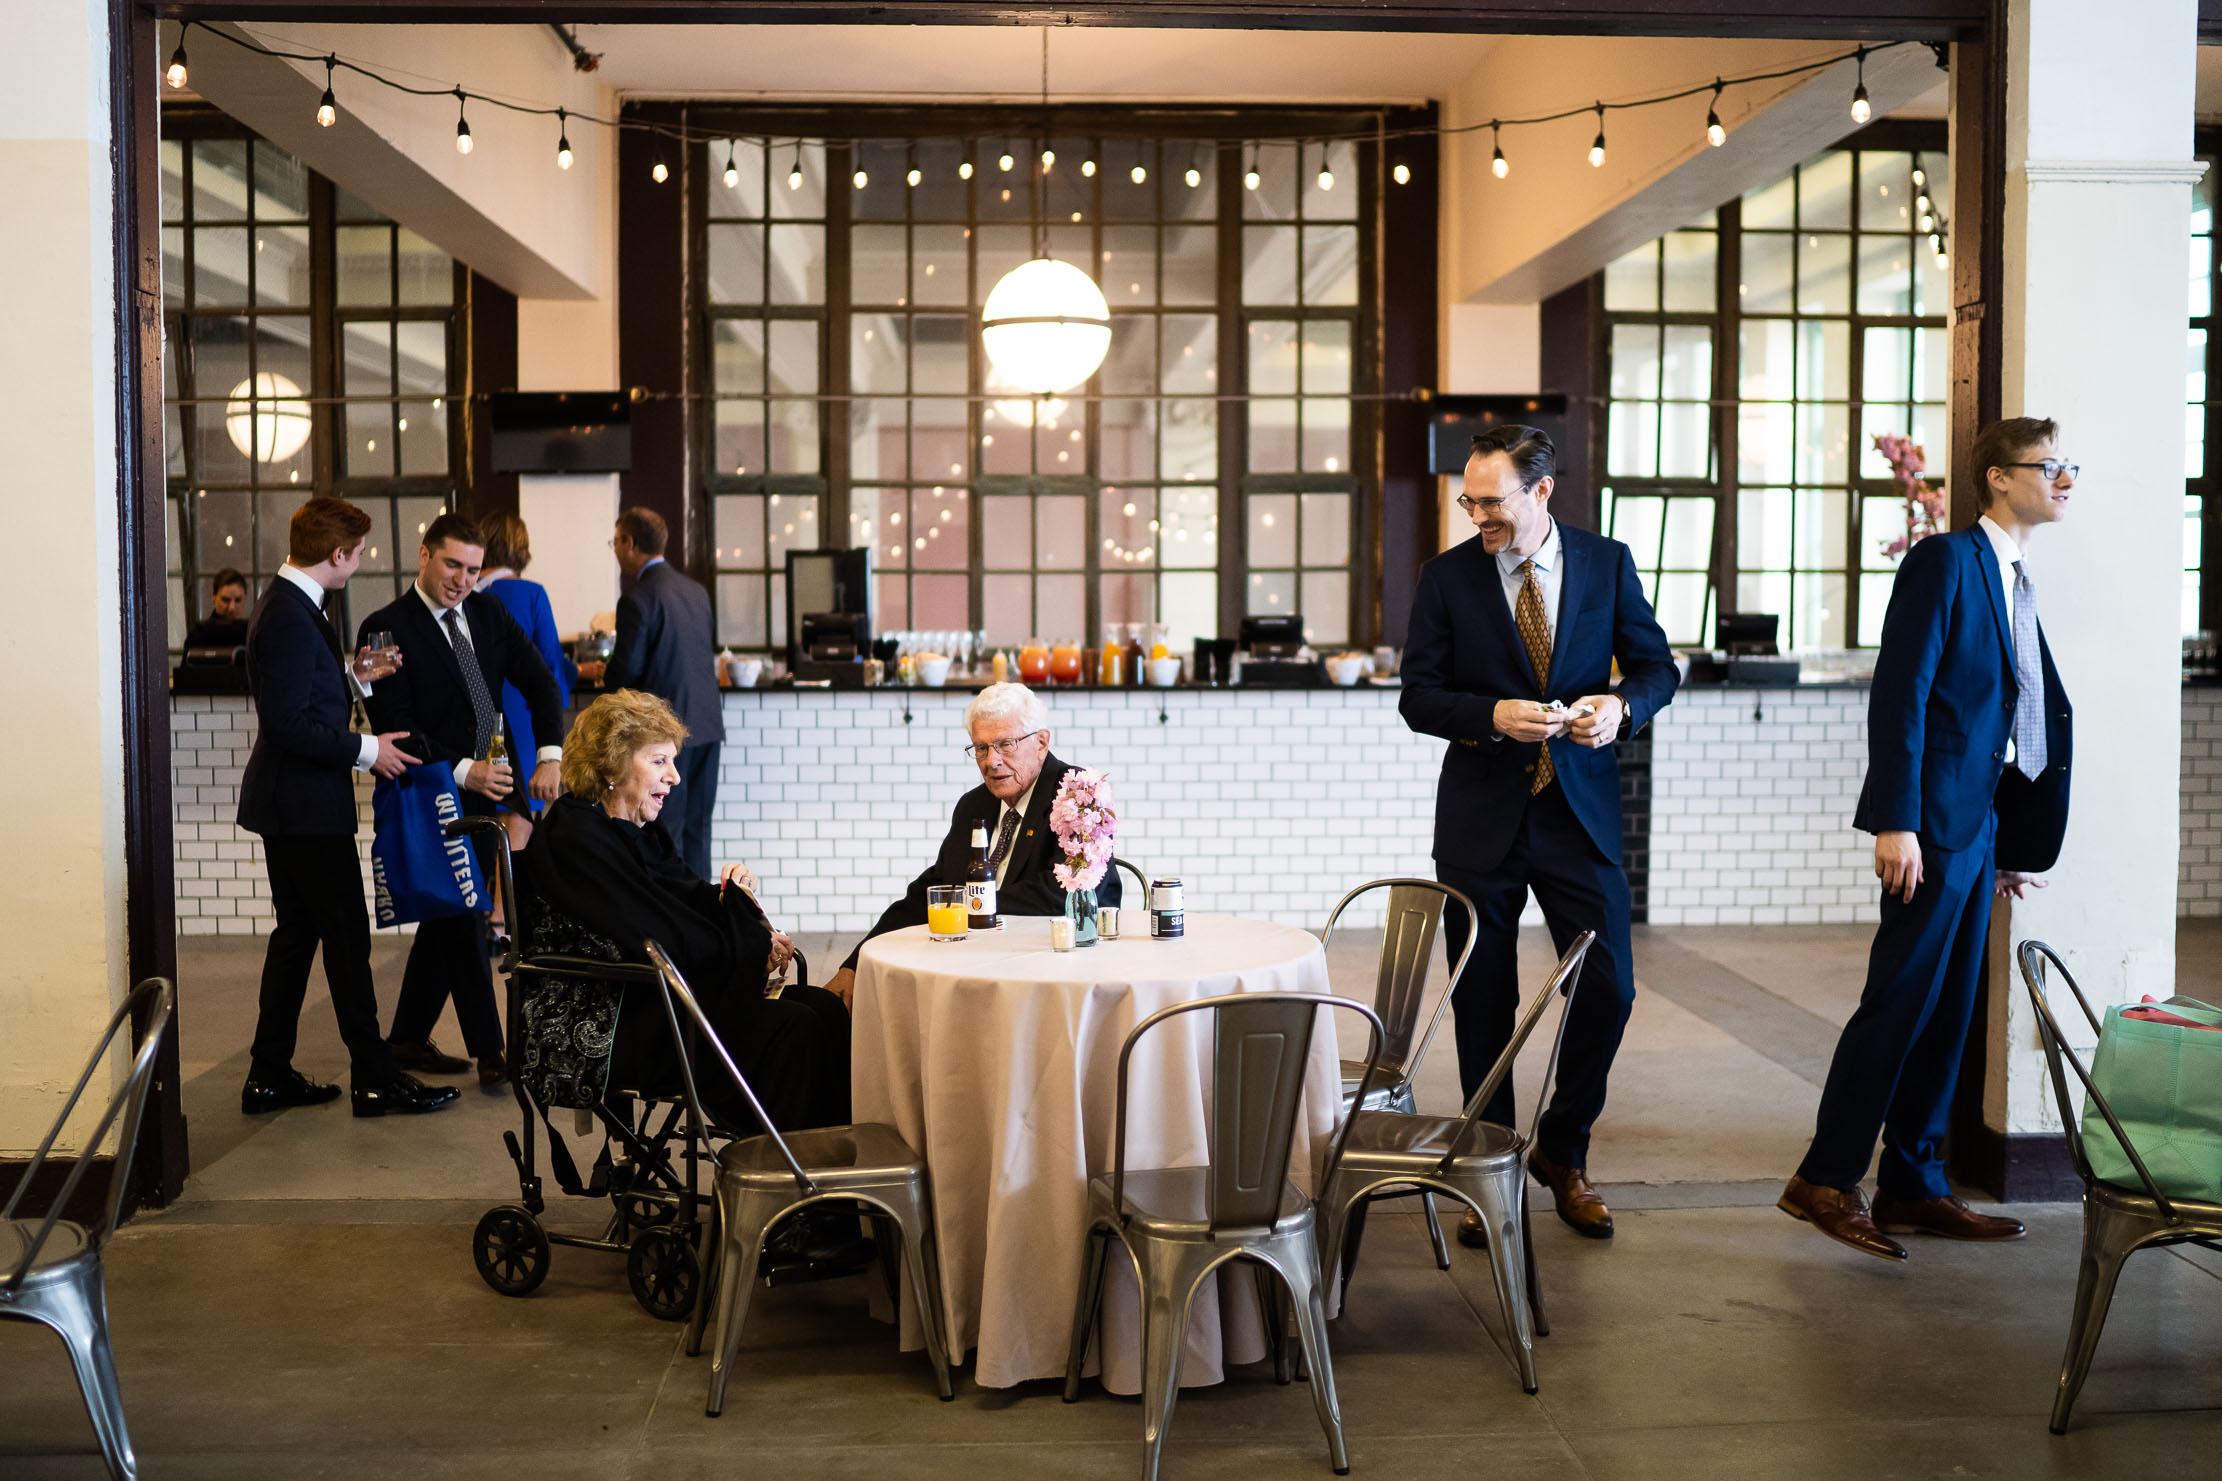 Asbury-Park-Convention-Hall-Wedding-2053.jpg